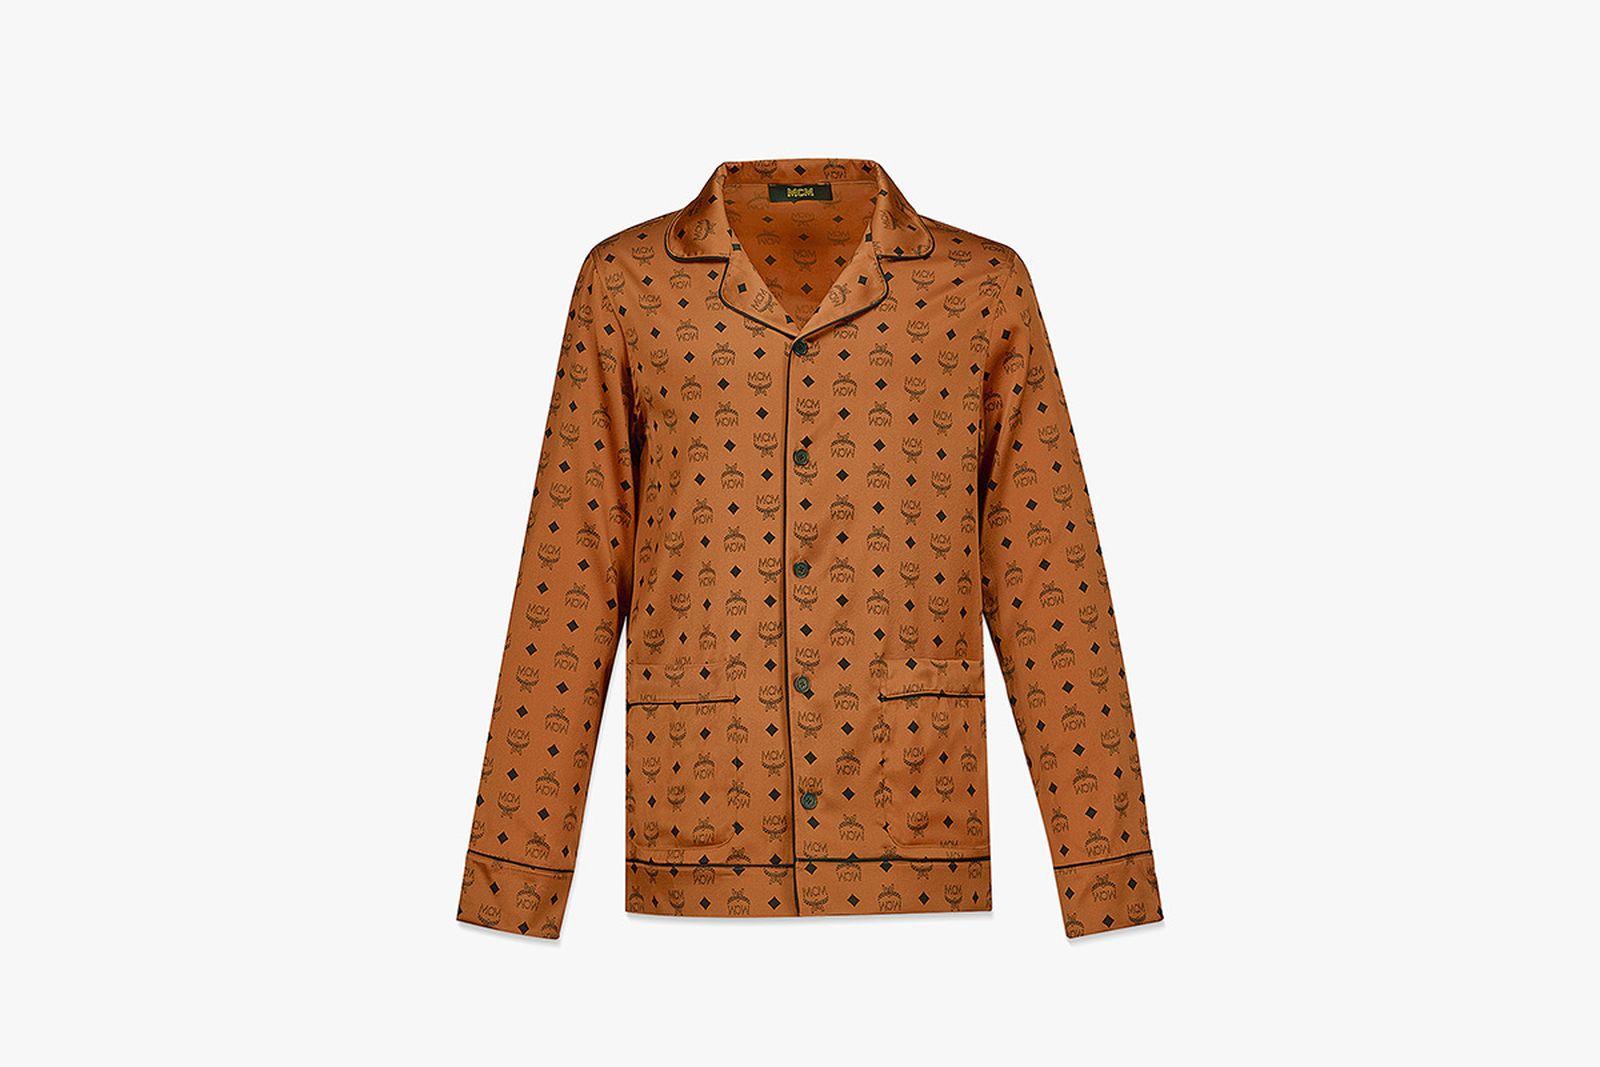 mcm-loungewear-04